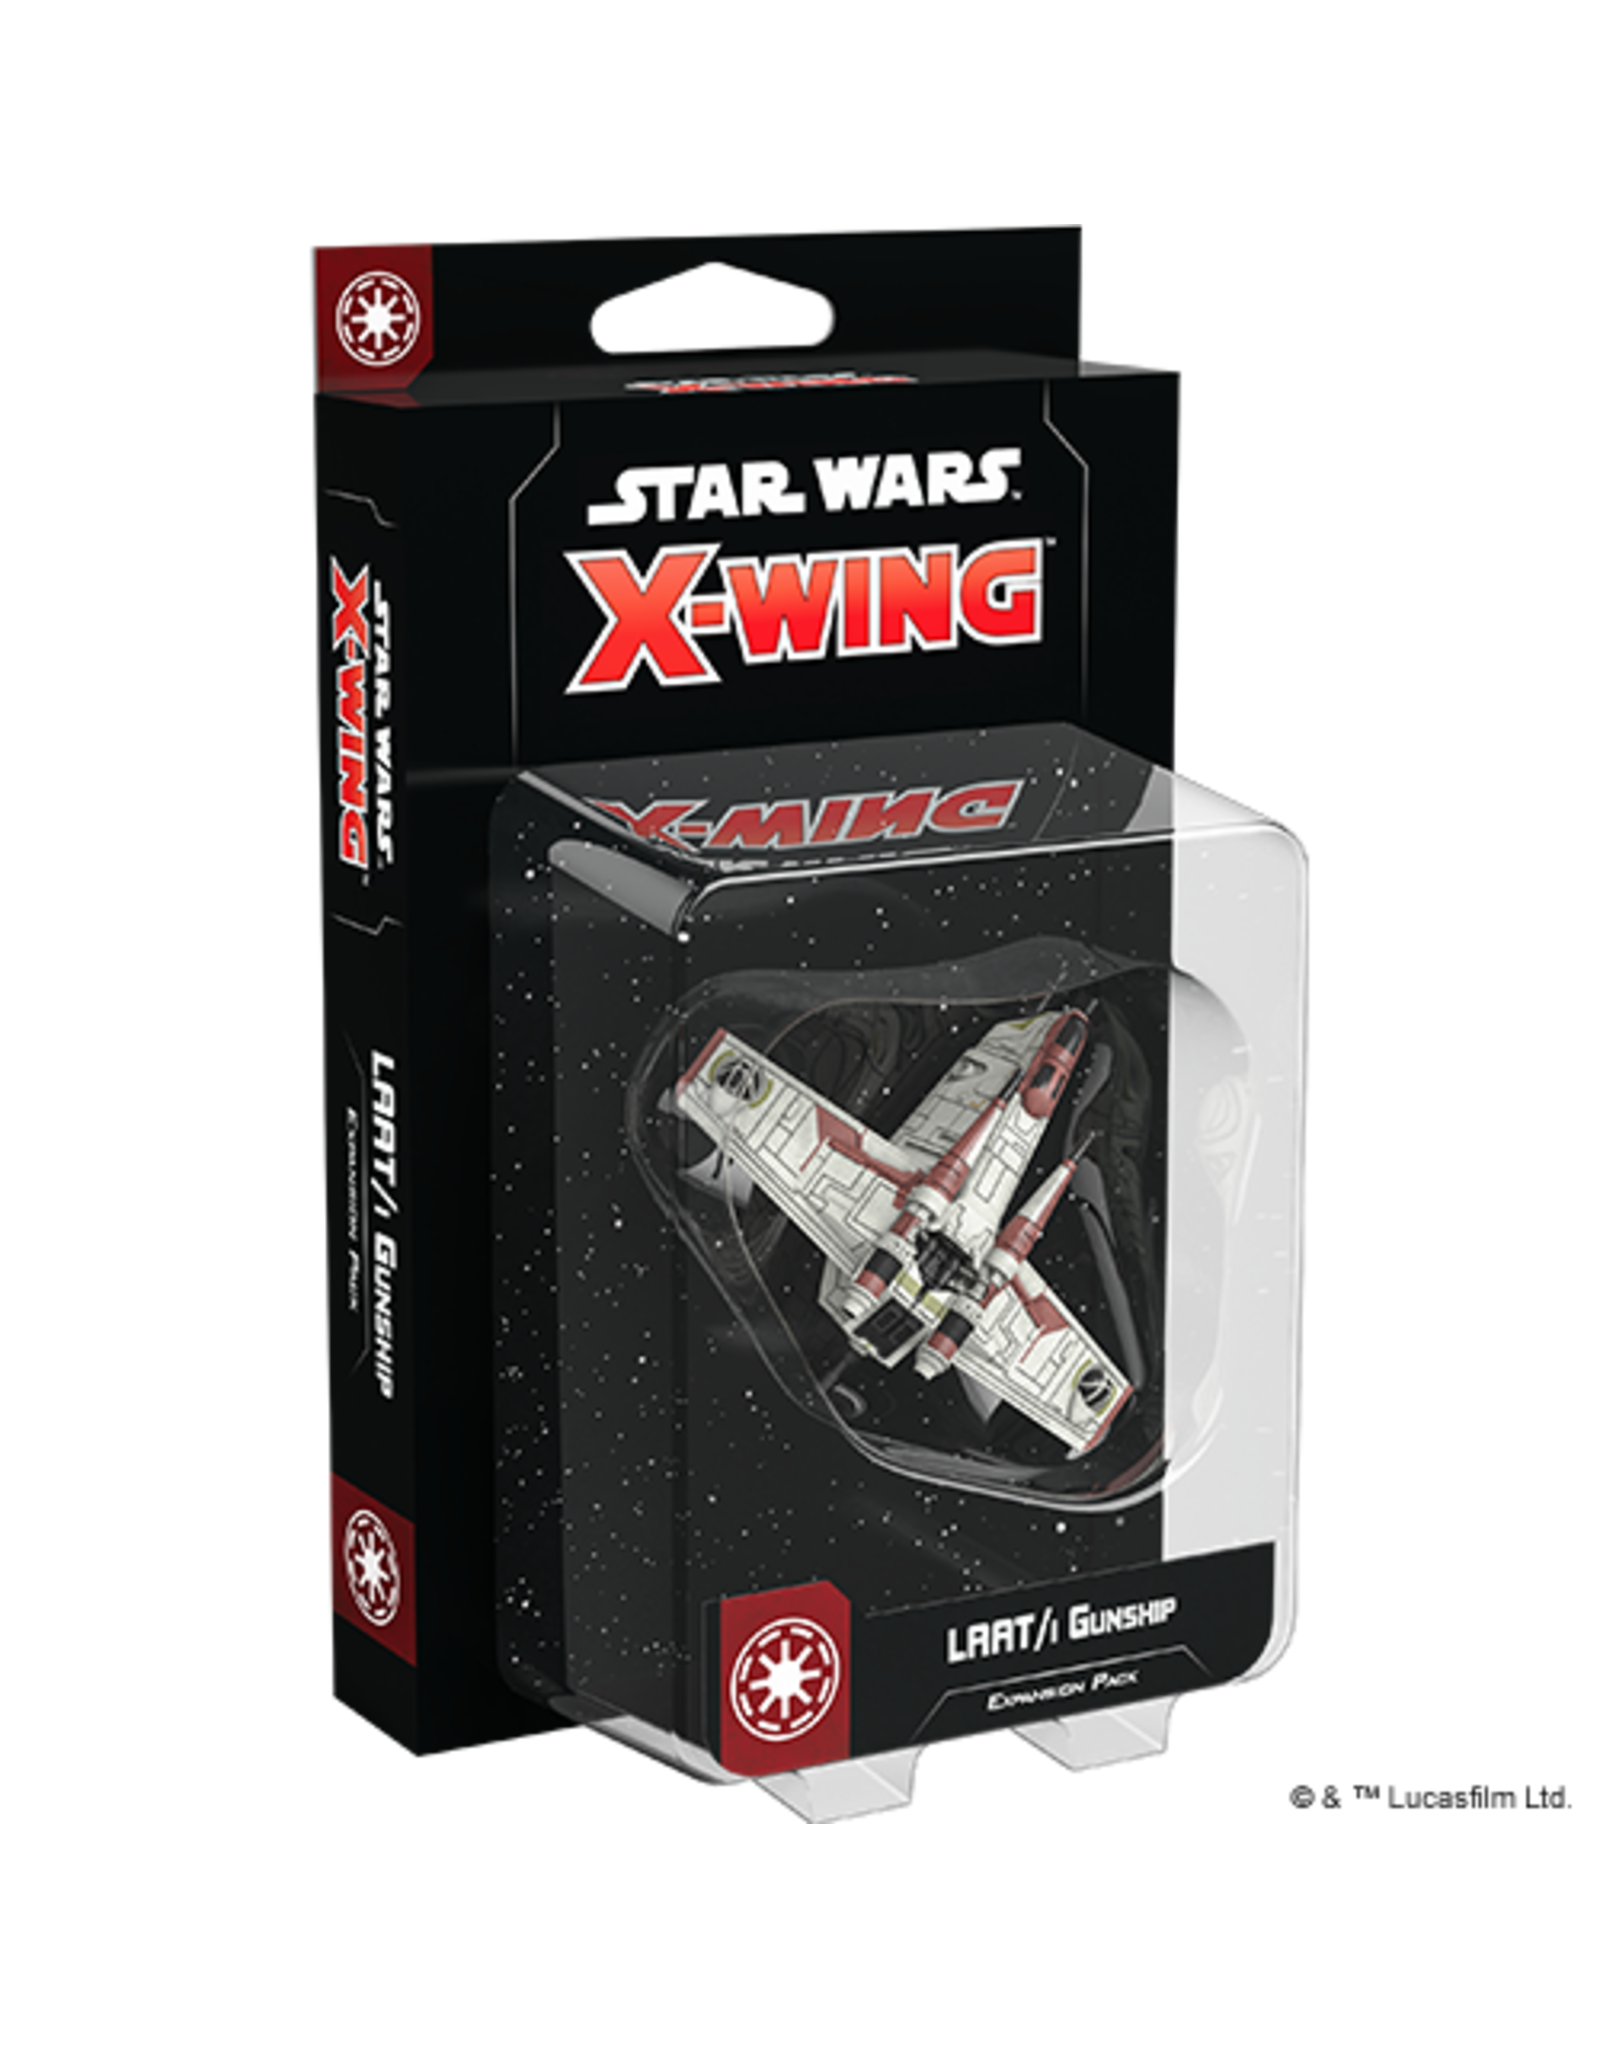 Fantasy Flight Games Star Wars  X-Wing 2E LAAT/i Gunship Expansion Pack